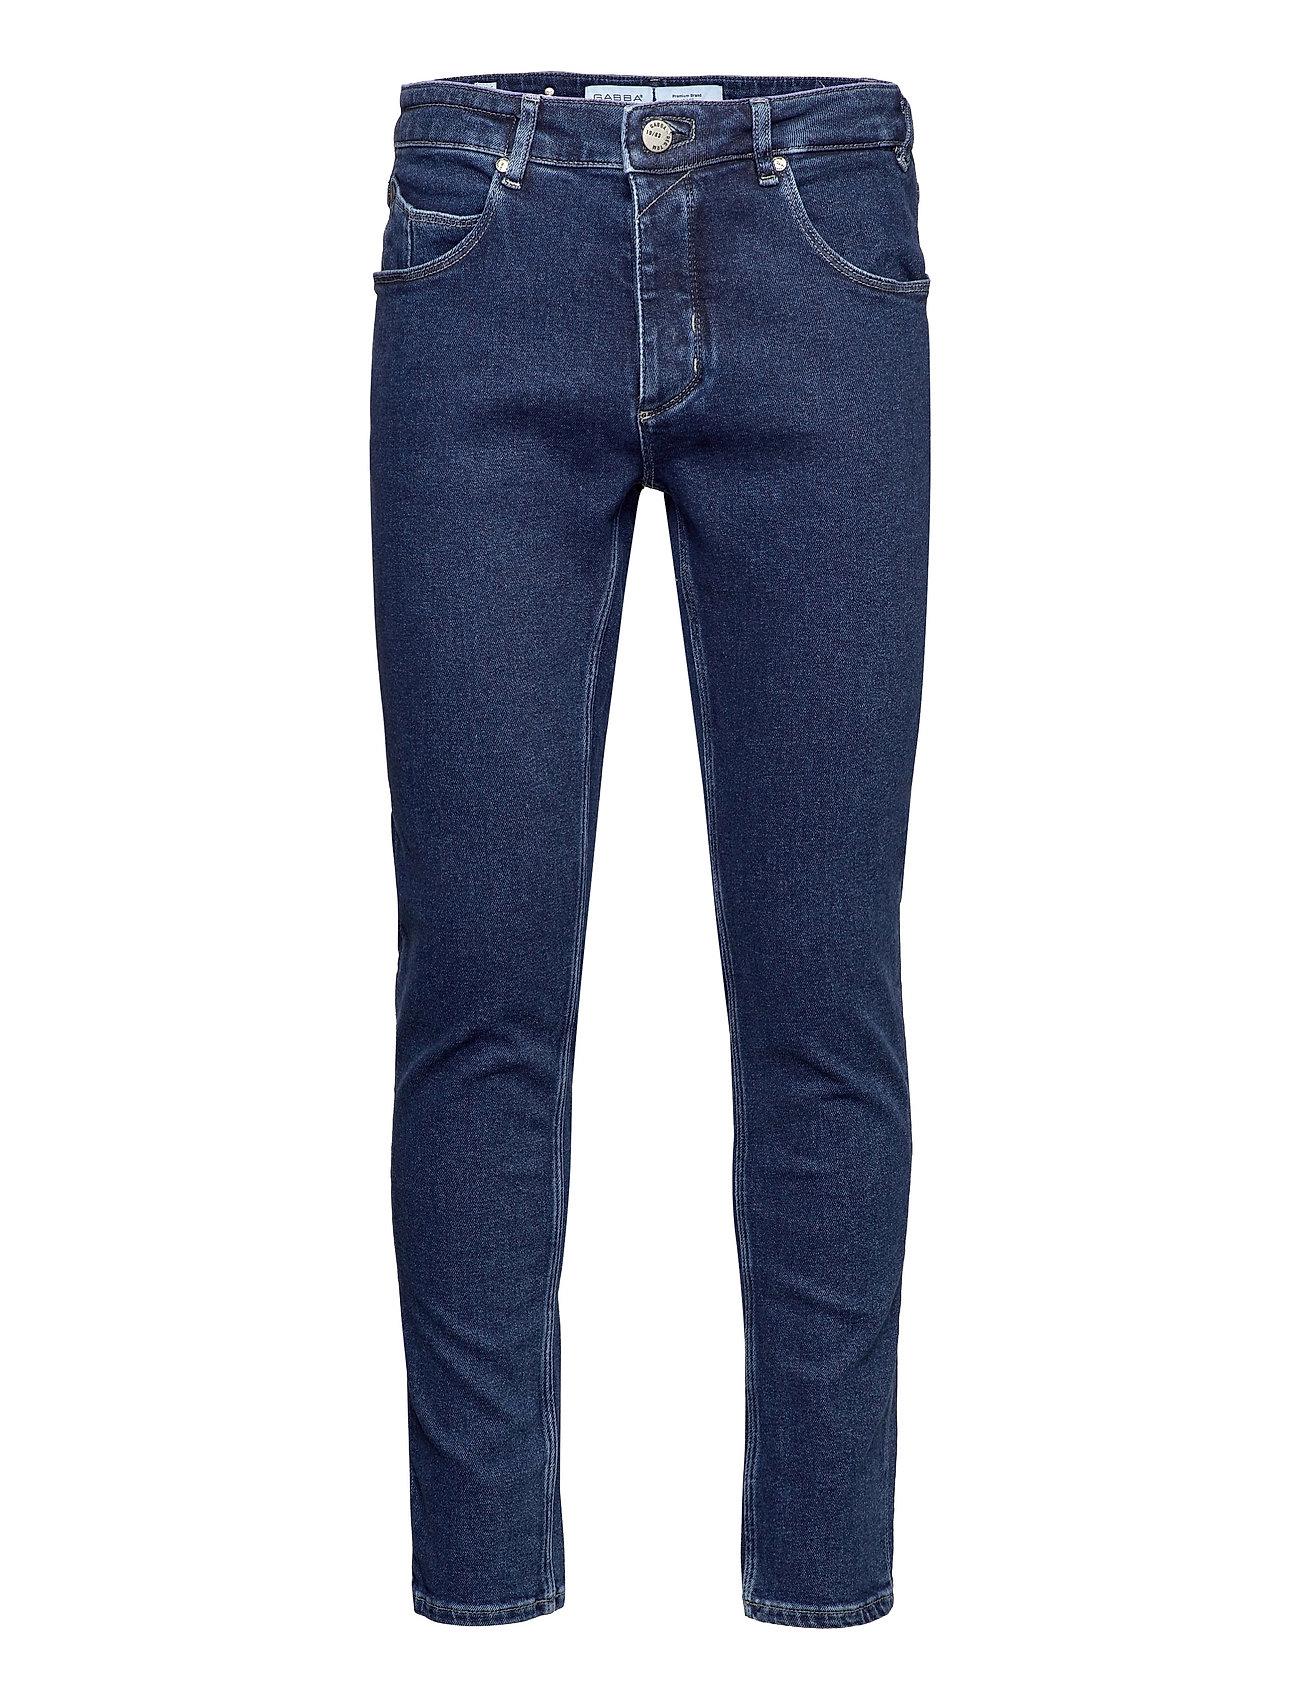 Image of Rey K3868 Jeans Slim Jeans Blå Gabba (3551194893)